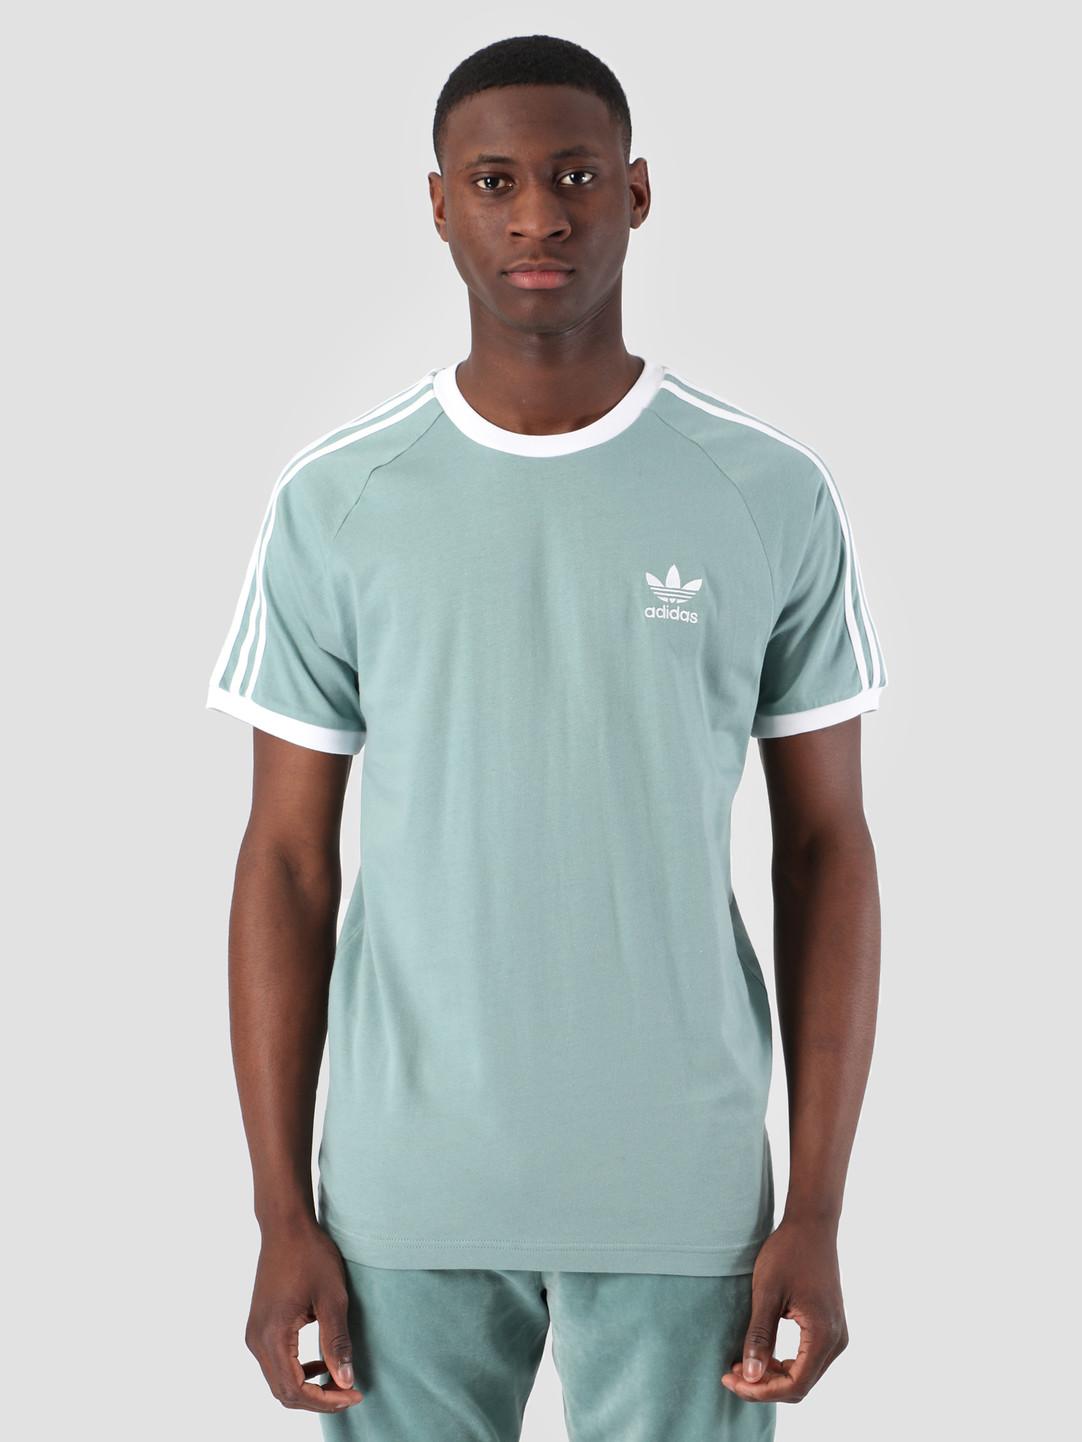 adidas adidas 3-Stripes T-Shirt Vapste DV1566